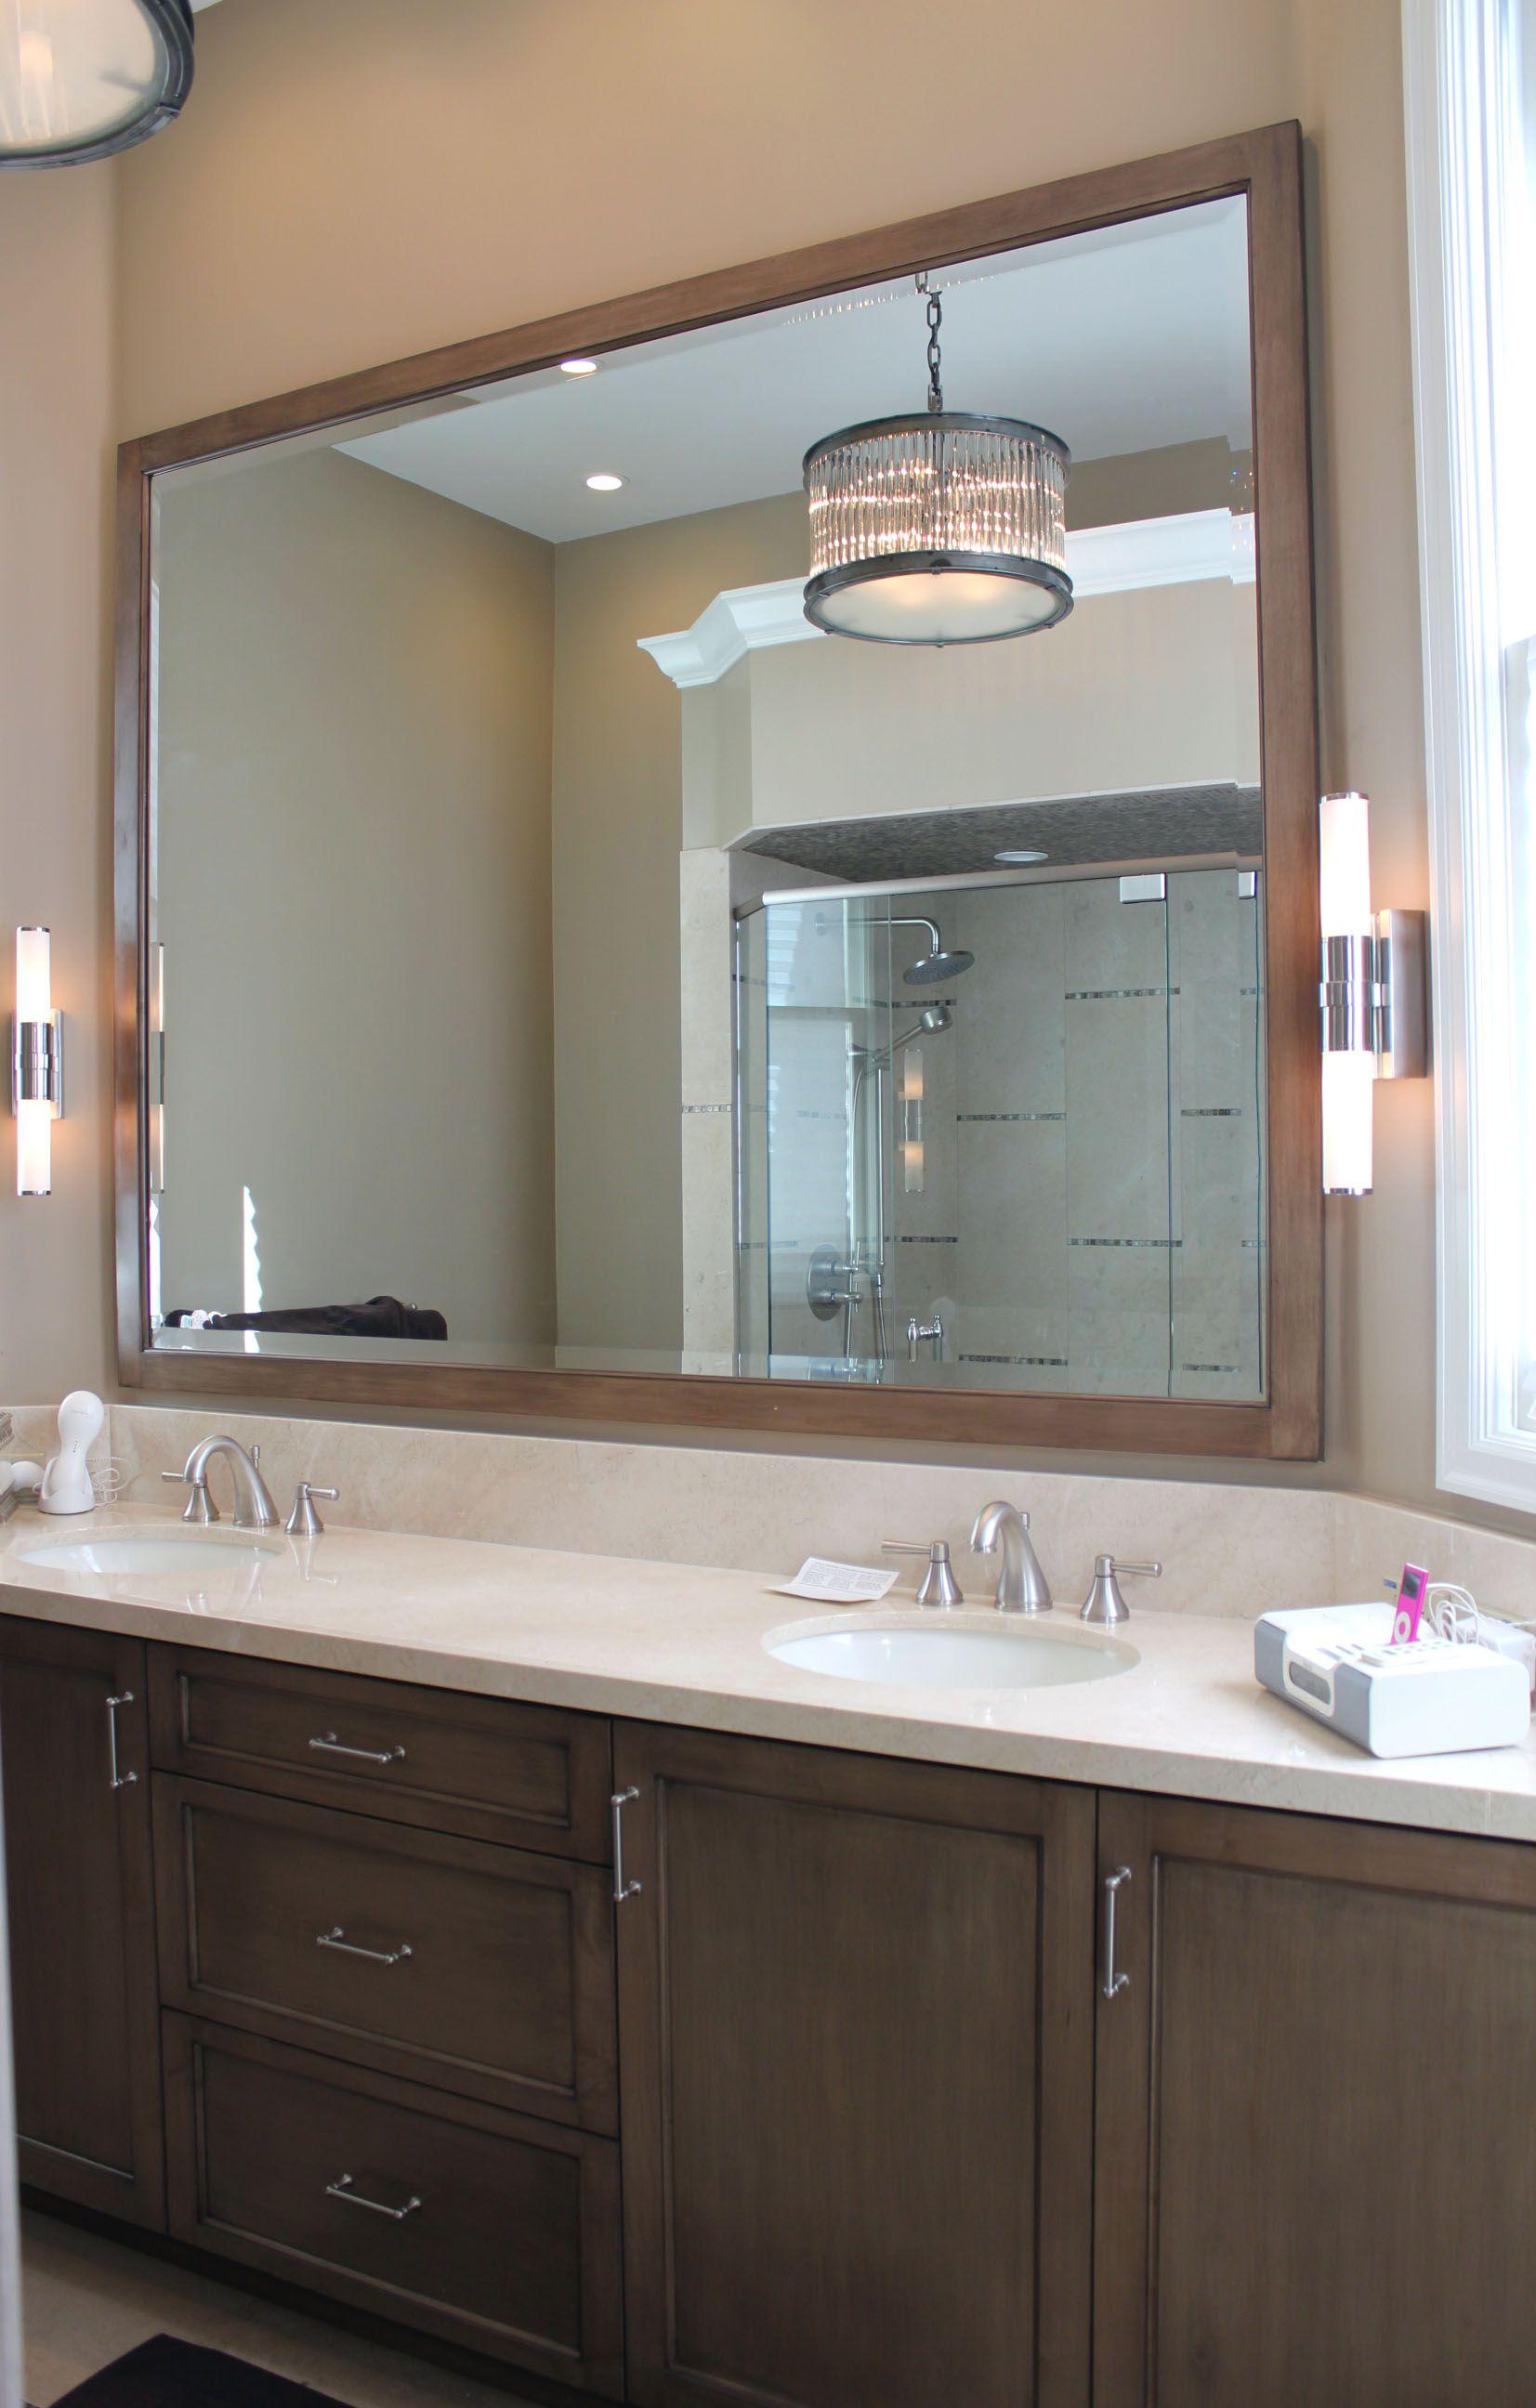 Master Bath Remodel San Francisco Ca  Completed In November Glamorous Bathroom Remodel San Francisco Inspiration